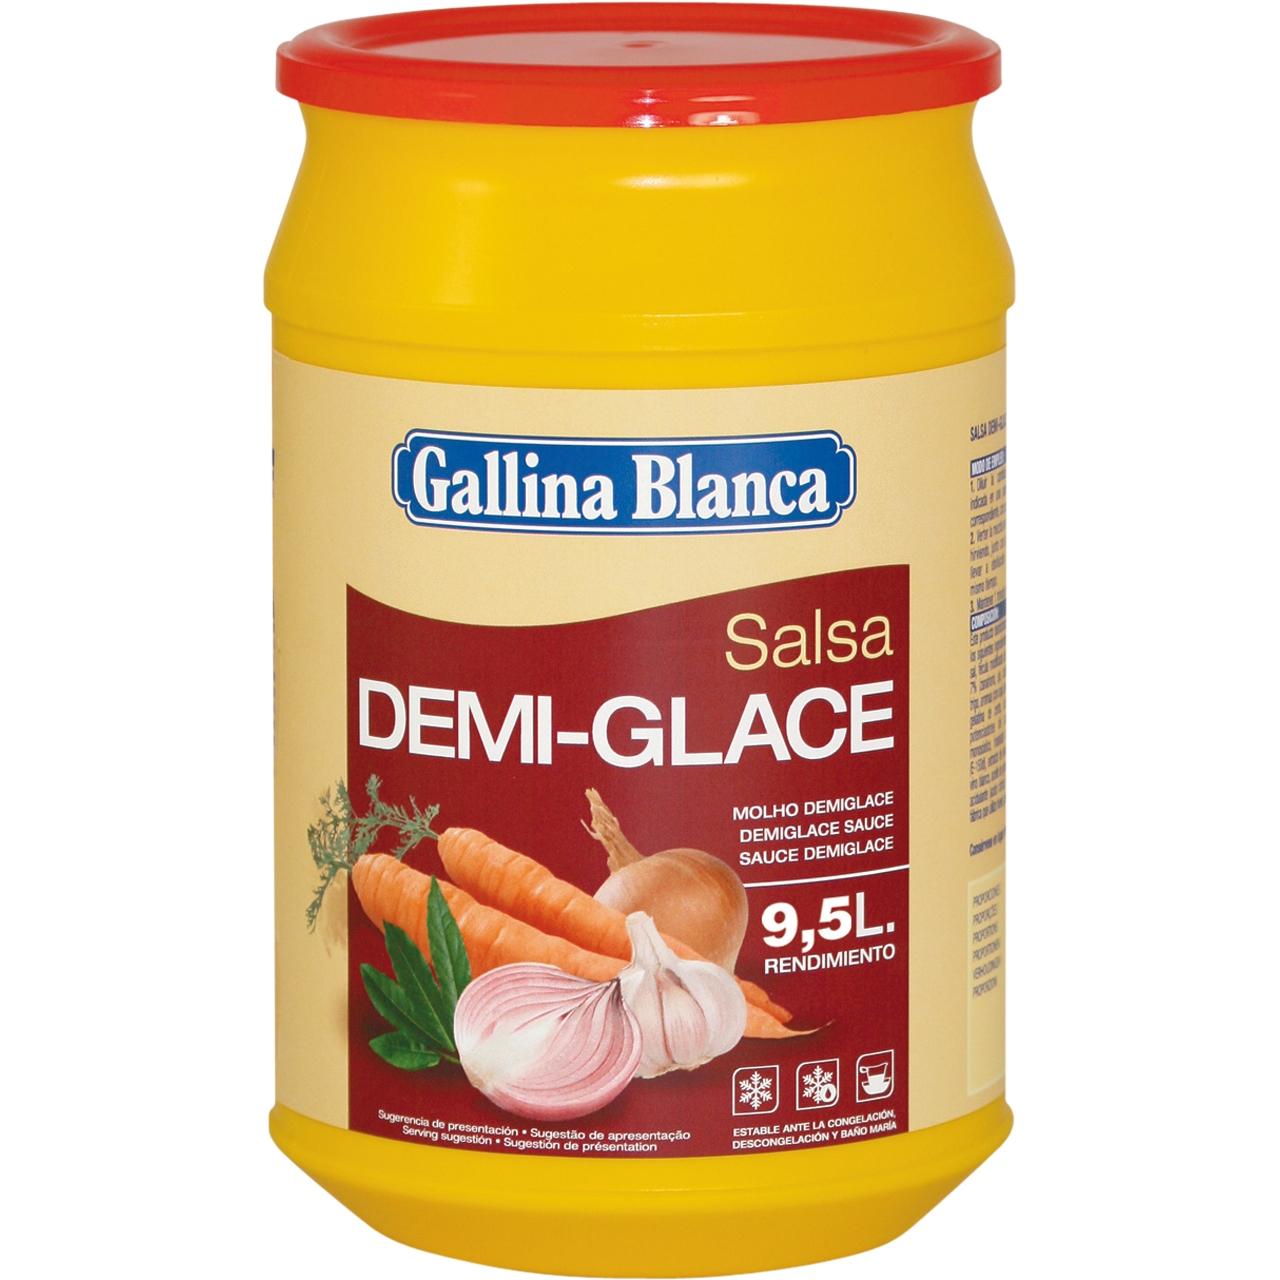 Salsa demi glace deshidratada 1kg. Gallina Blanca